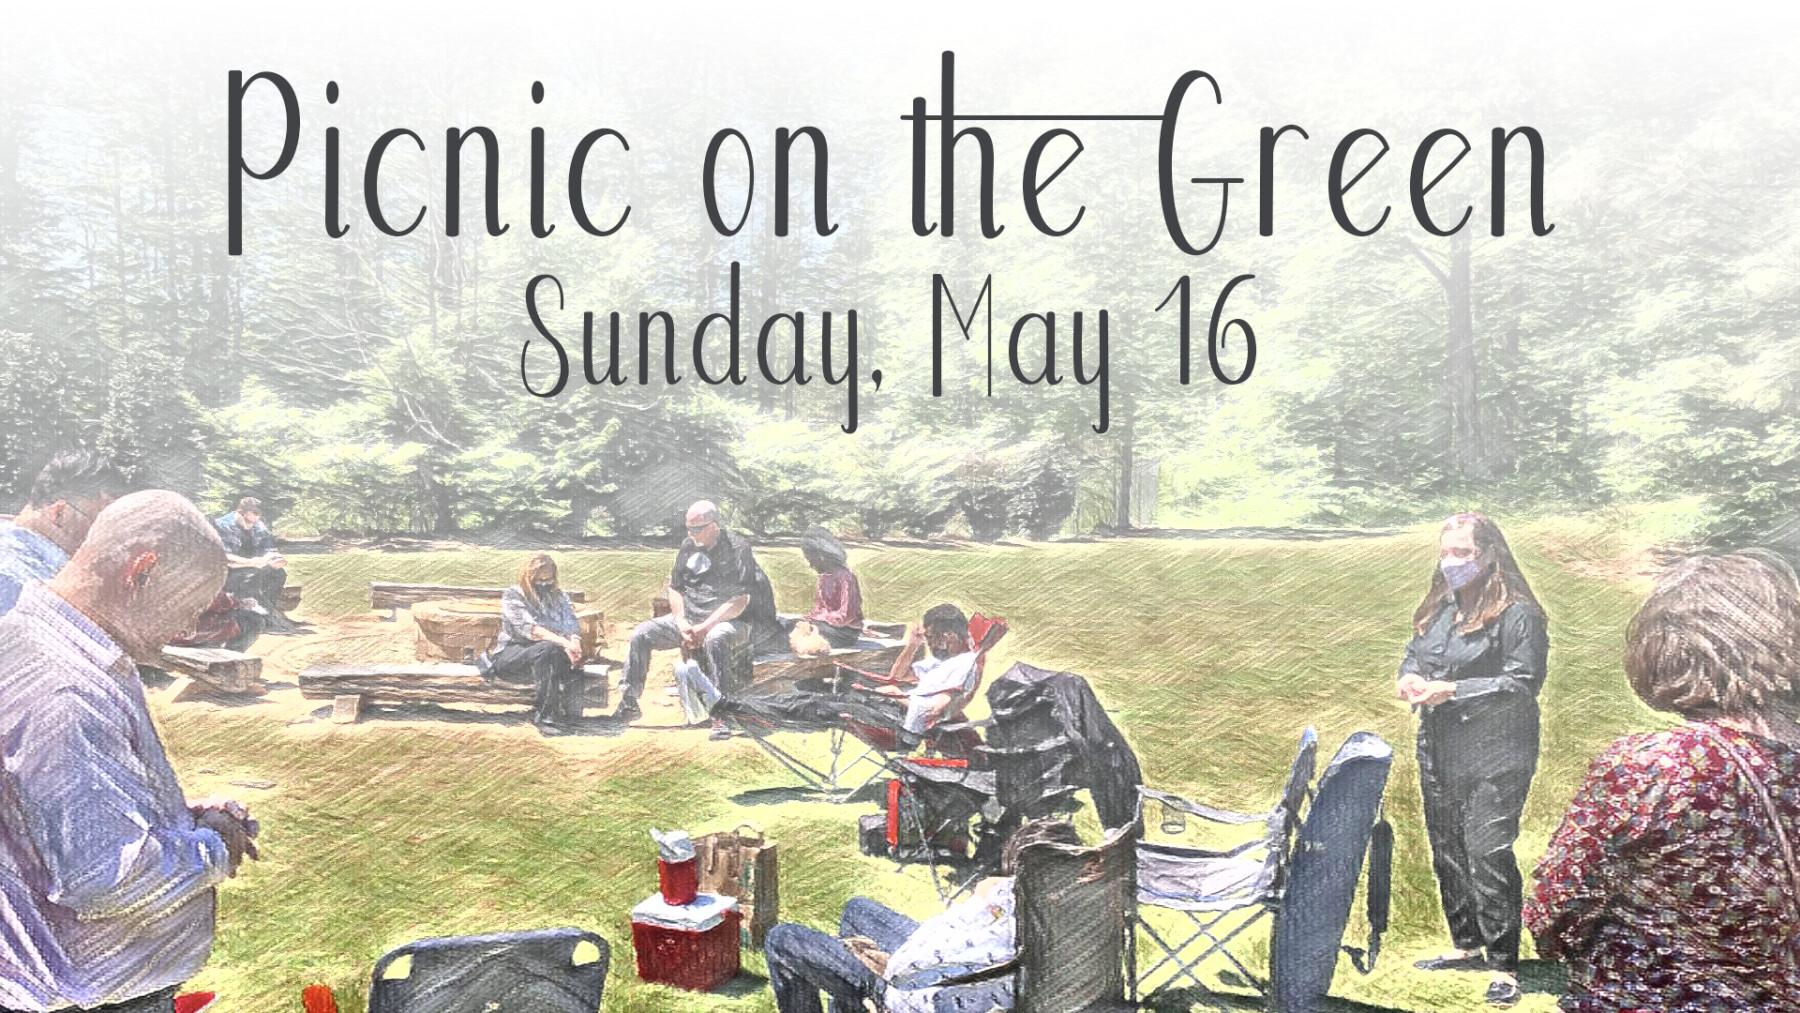 Fellowship Family Picnic on the Green